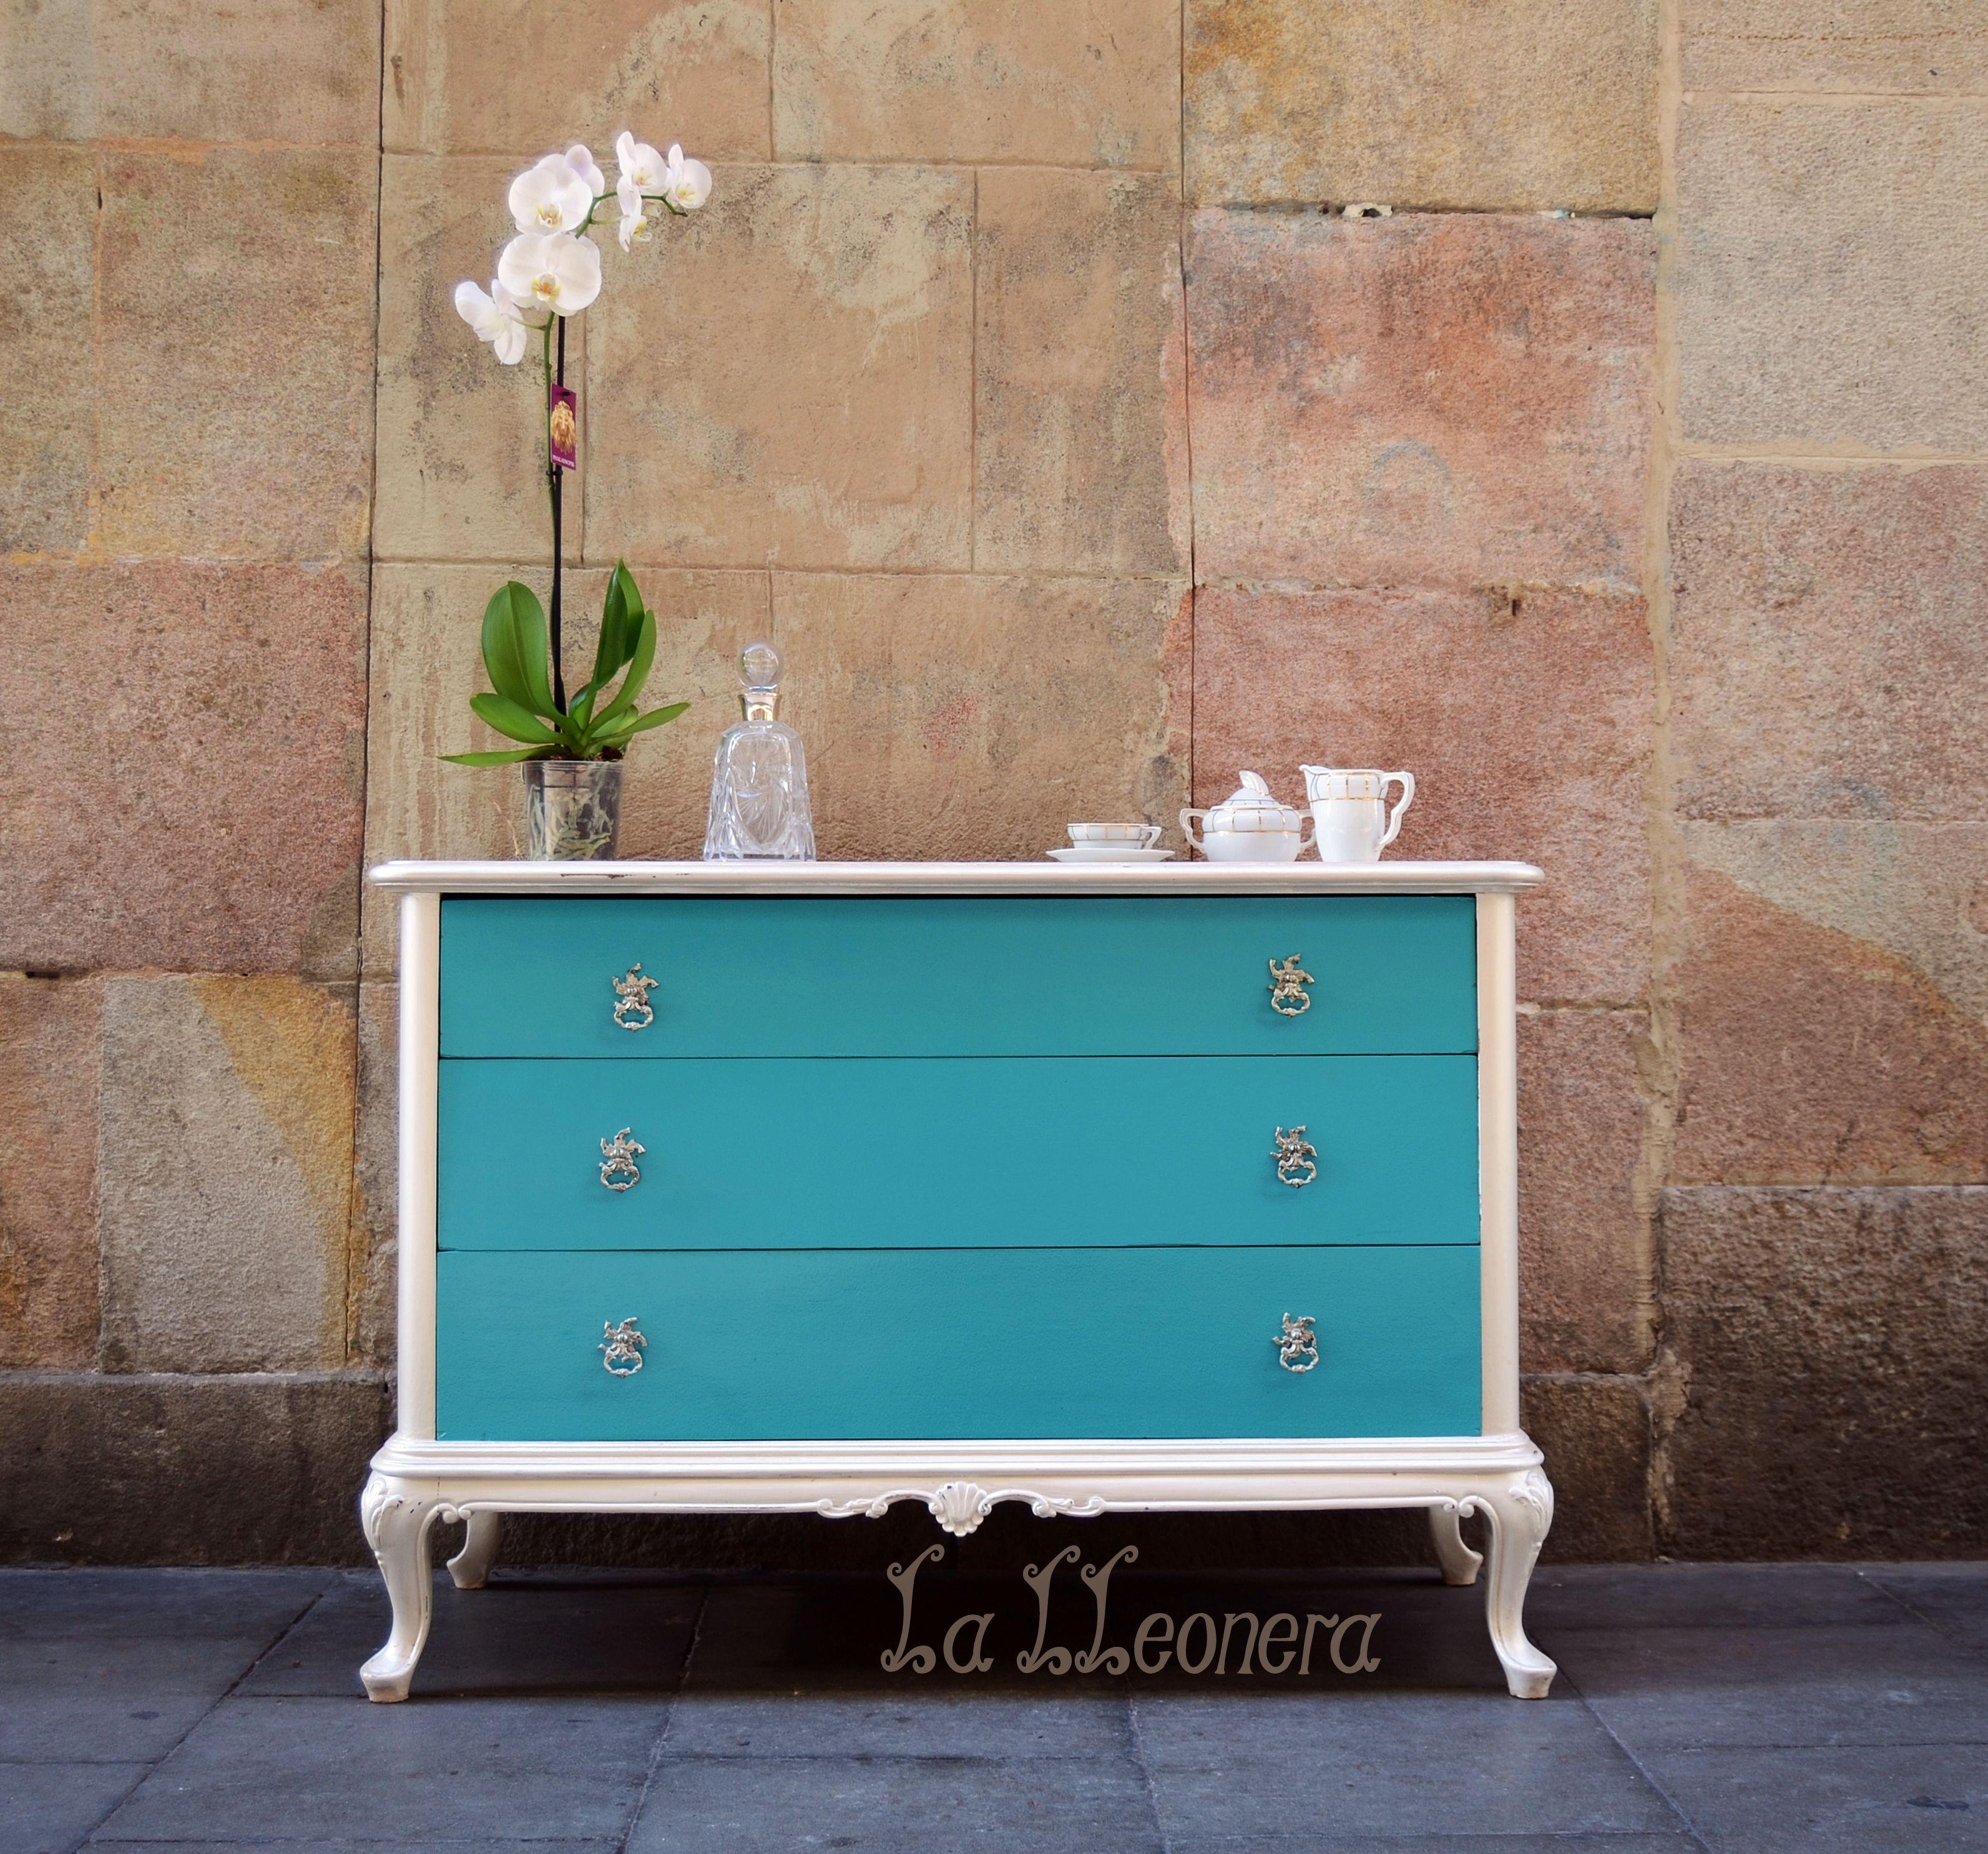 C Moda Turquesa Y Blanco Perla De Estilo Provenzal La Lleonera  # Muebles Turquesa